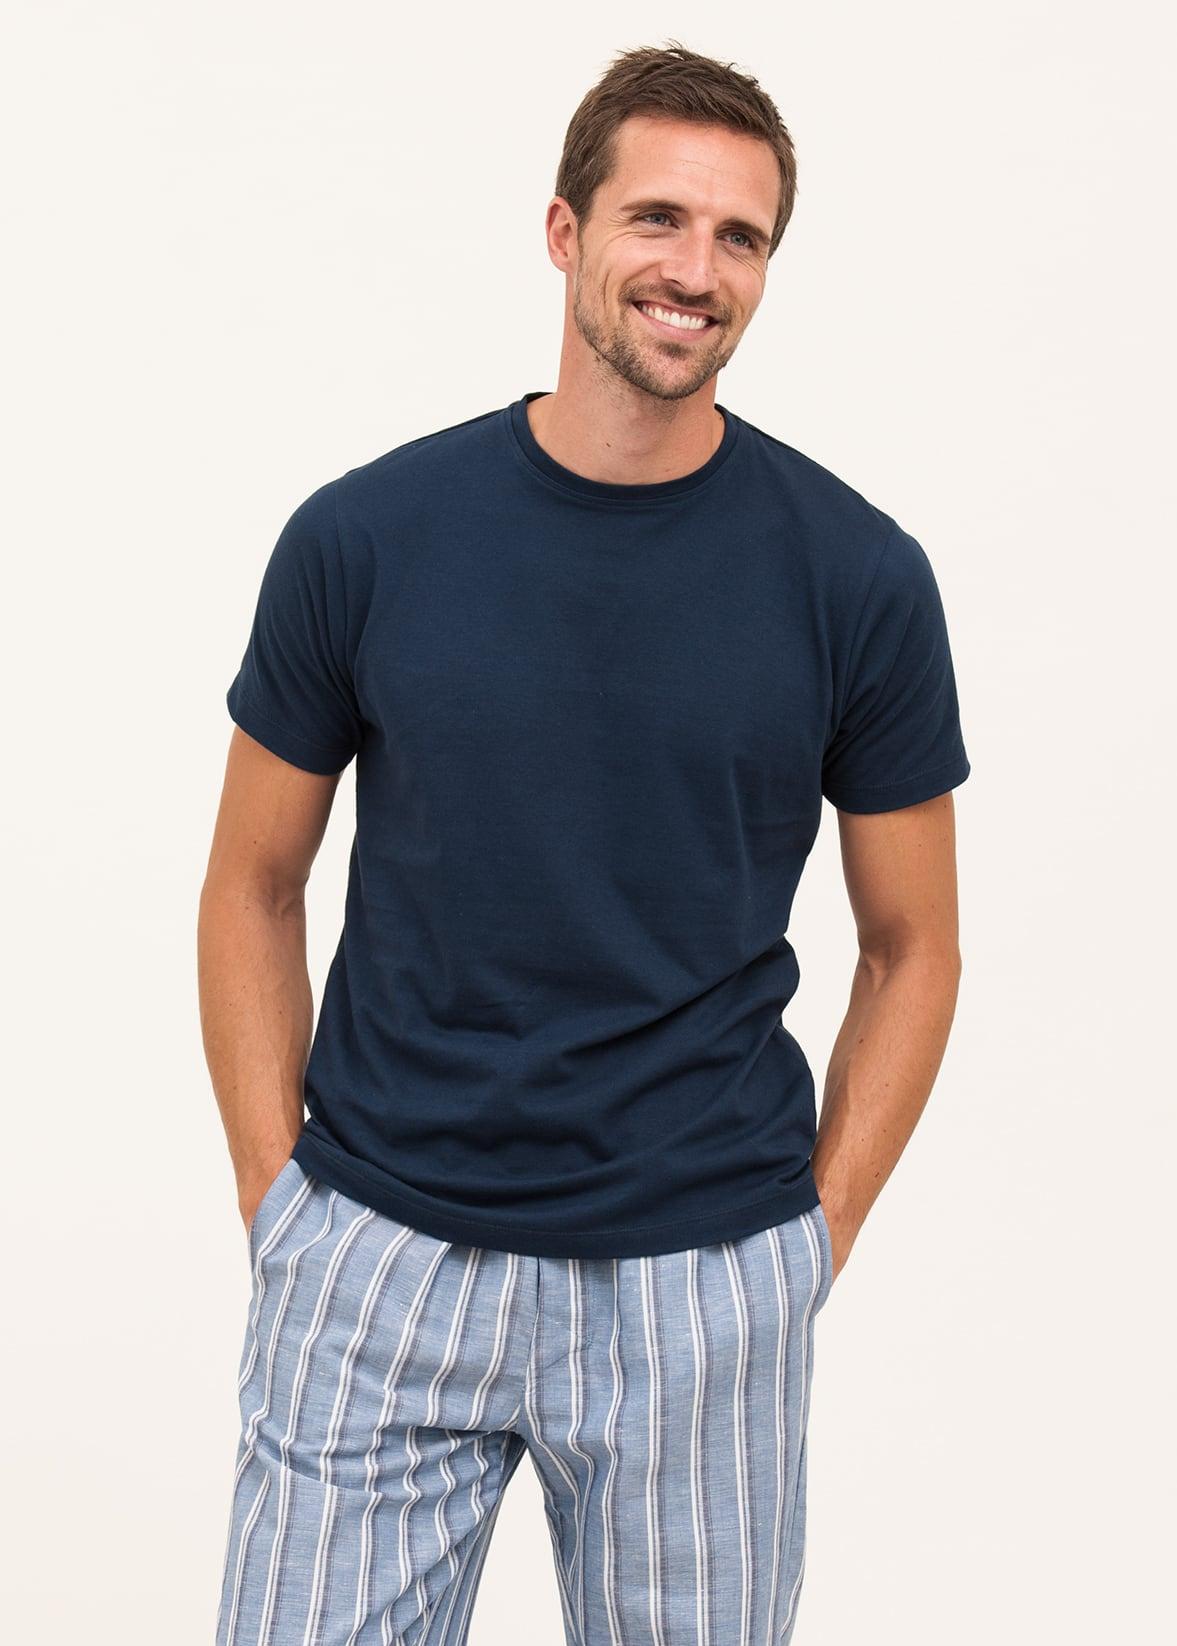 f8a90e2c23d4 Men's Linen/Cotton Blend Pyjama Trousers   Blue & White Stripe   PJ Pan